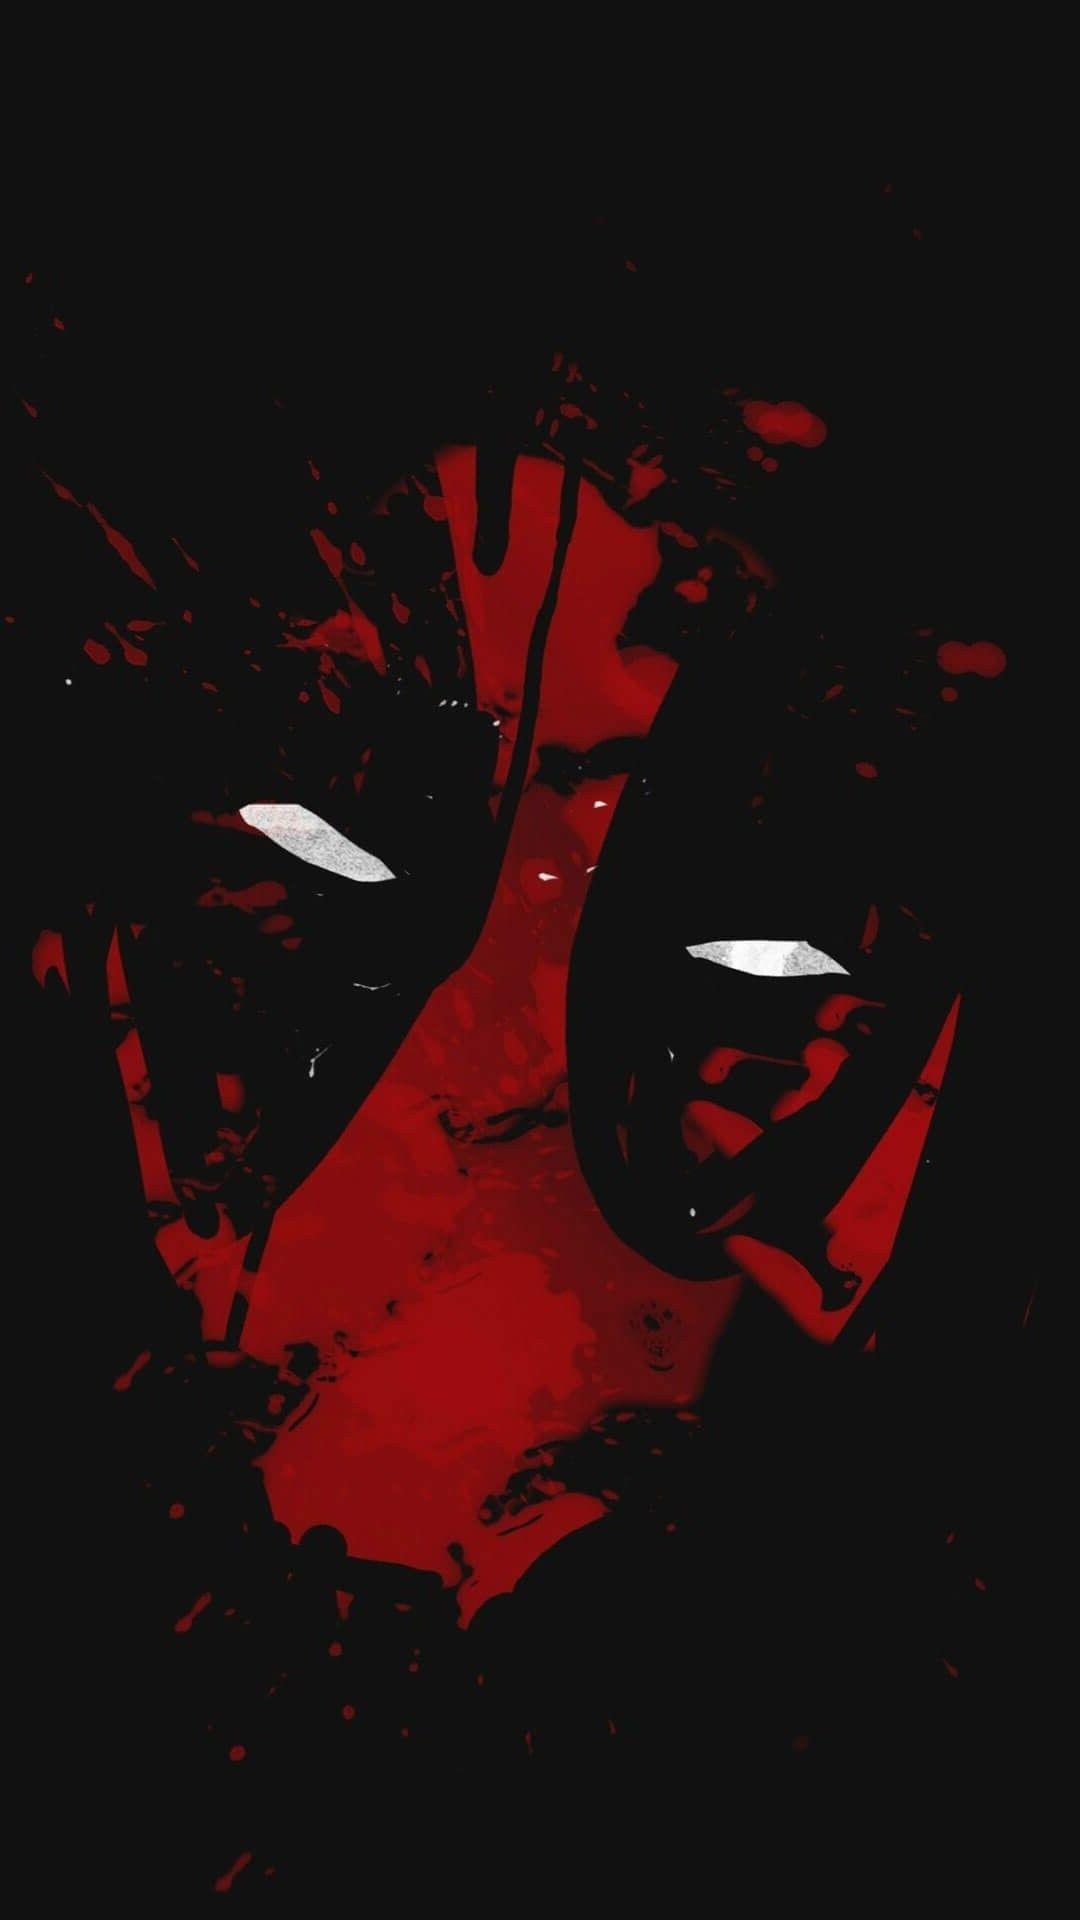 Deadpool Wallpaper Mobile 83 Images